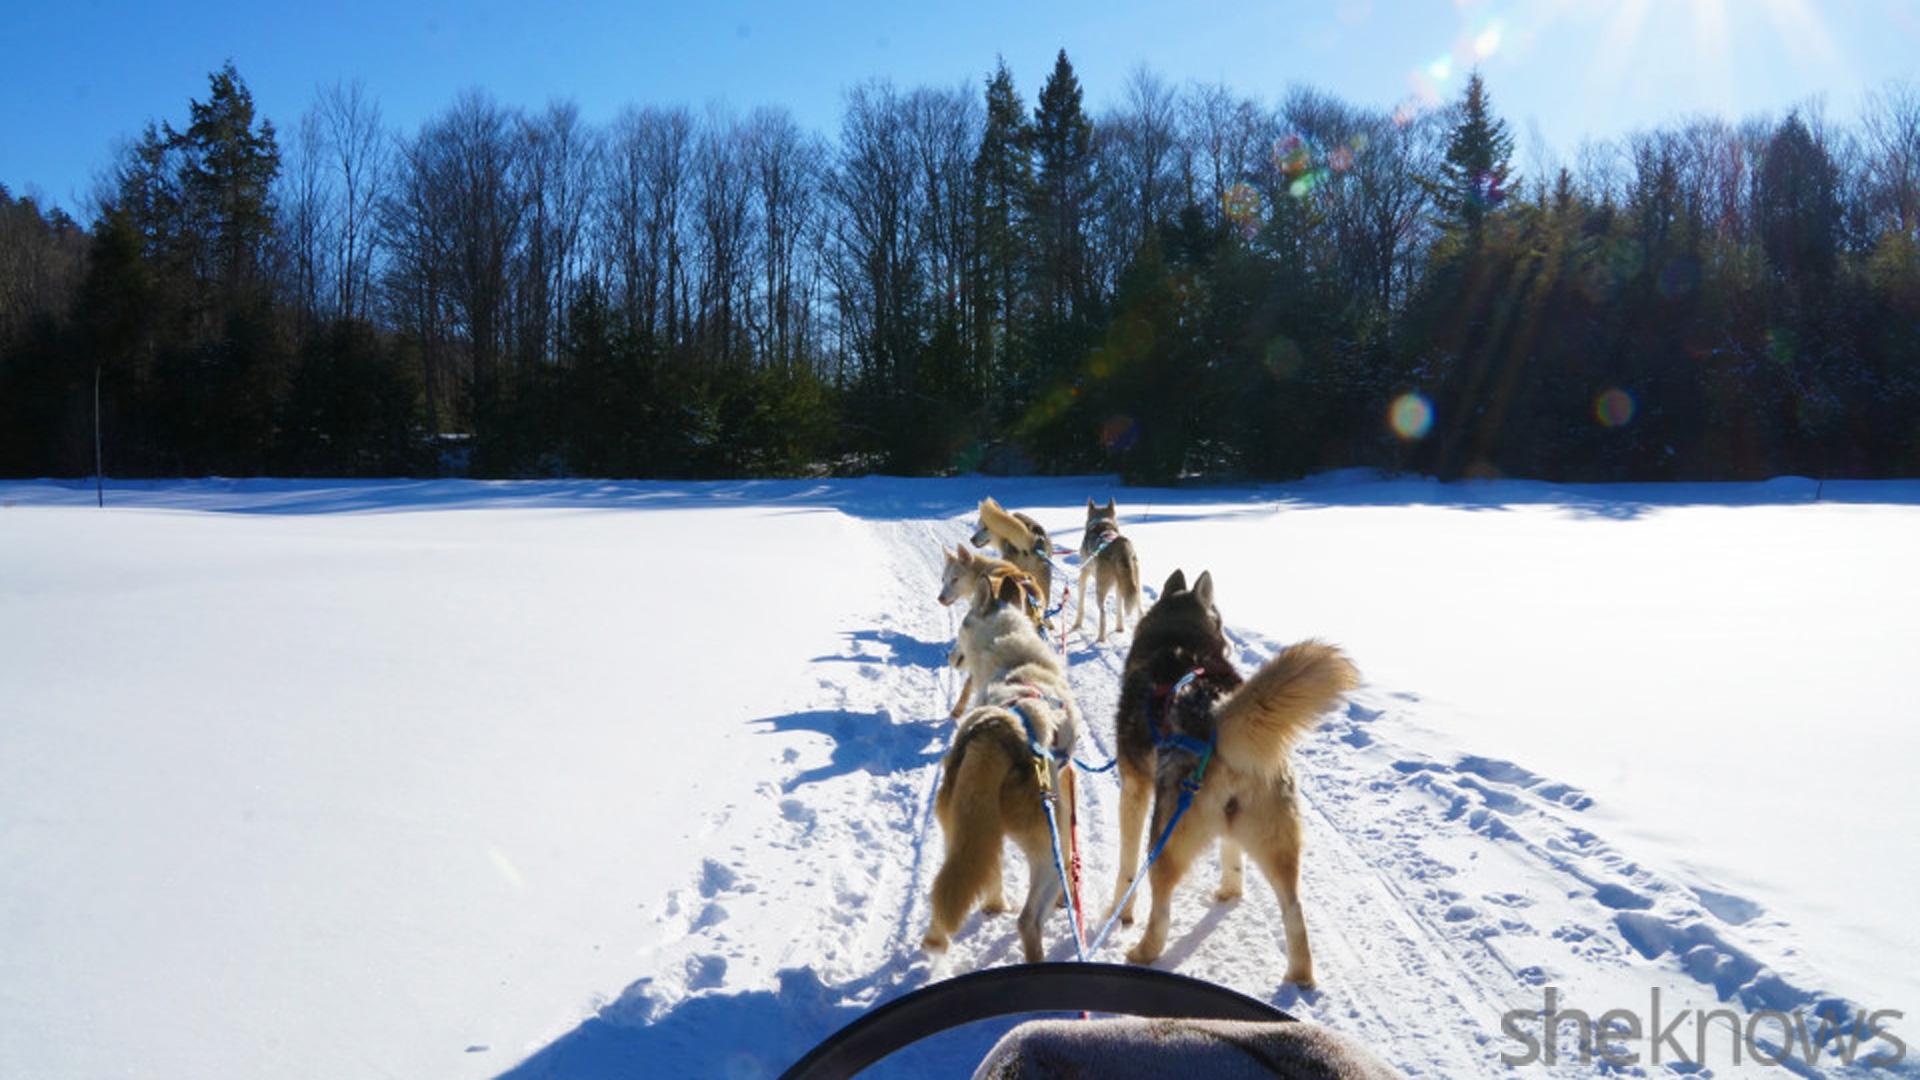 Snow Vacation